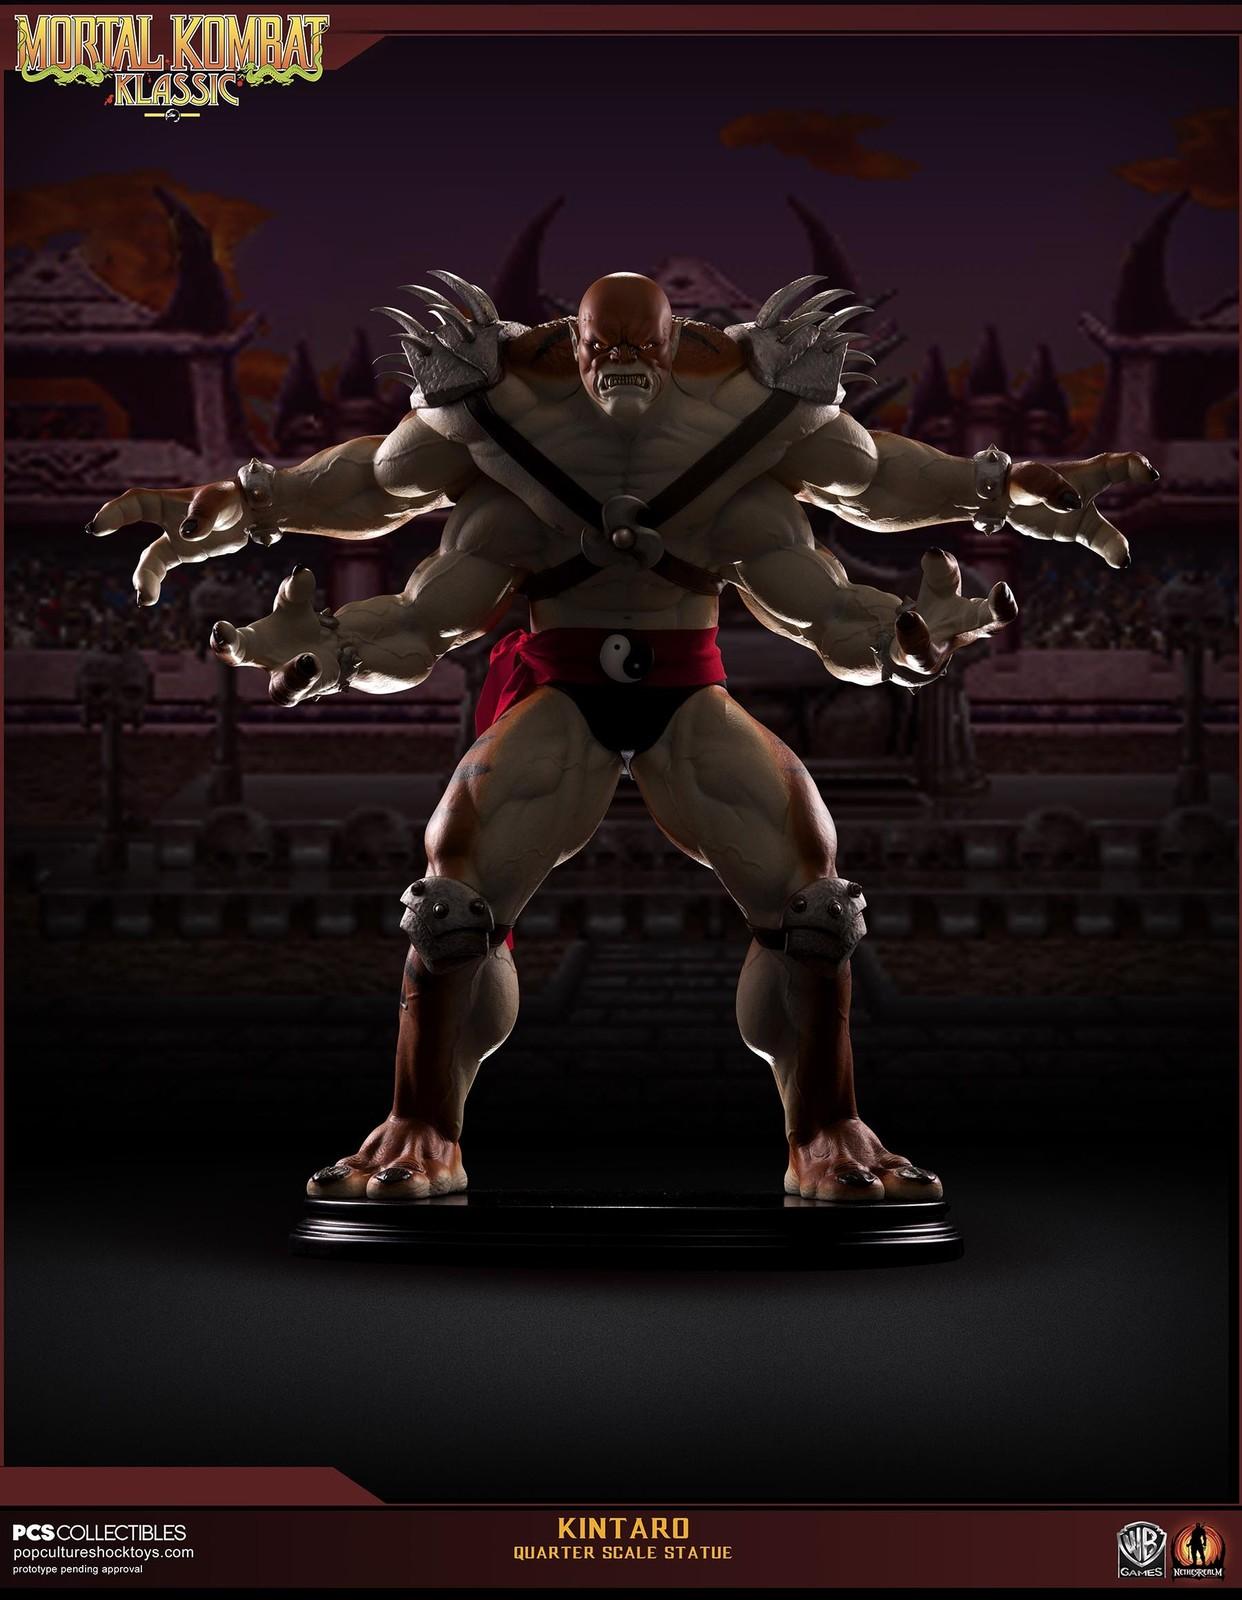 Mortal Kombat - Kintaro 1:4 Scale Statue image